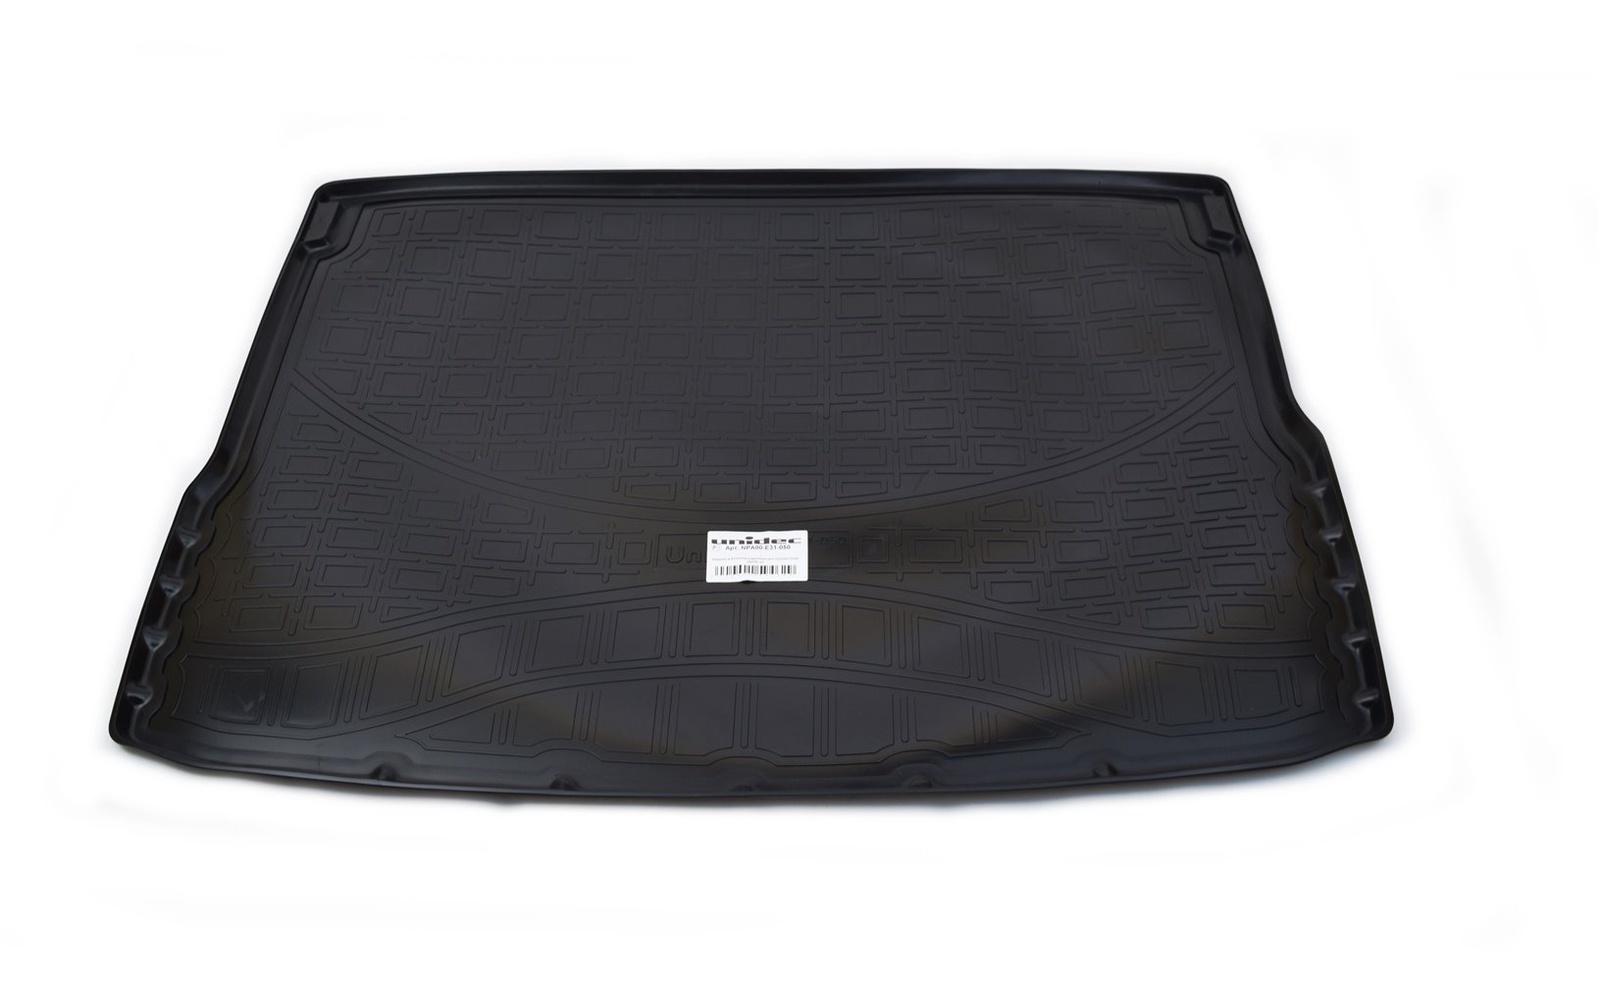 Коврик в багажник Norplast npa00-e43-265 коврик багажника norplast для jeep grand cherokee wk 2010 npa00 t40 100 b бежевый